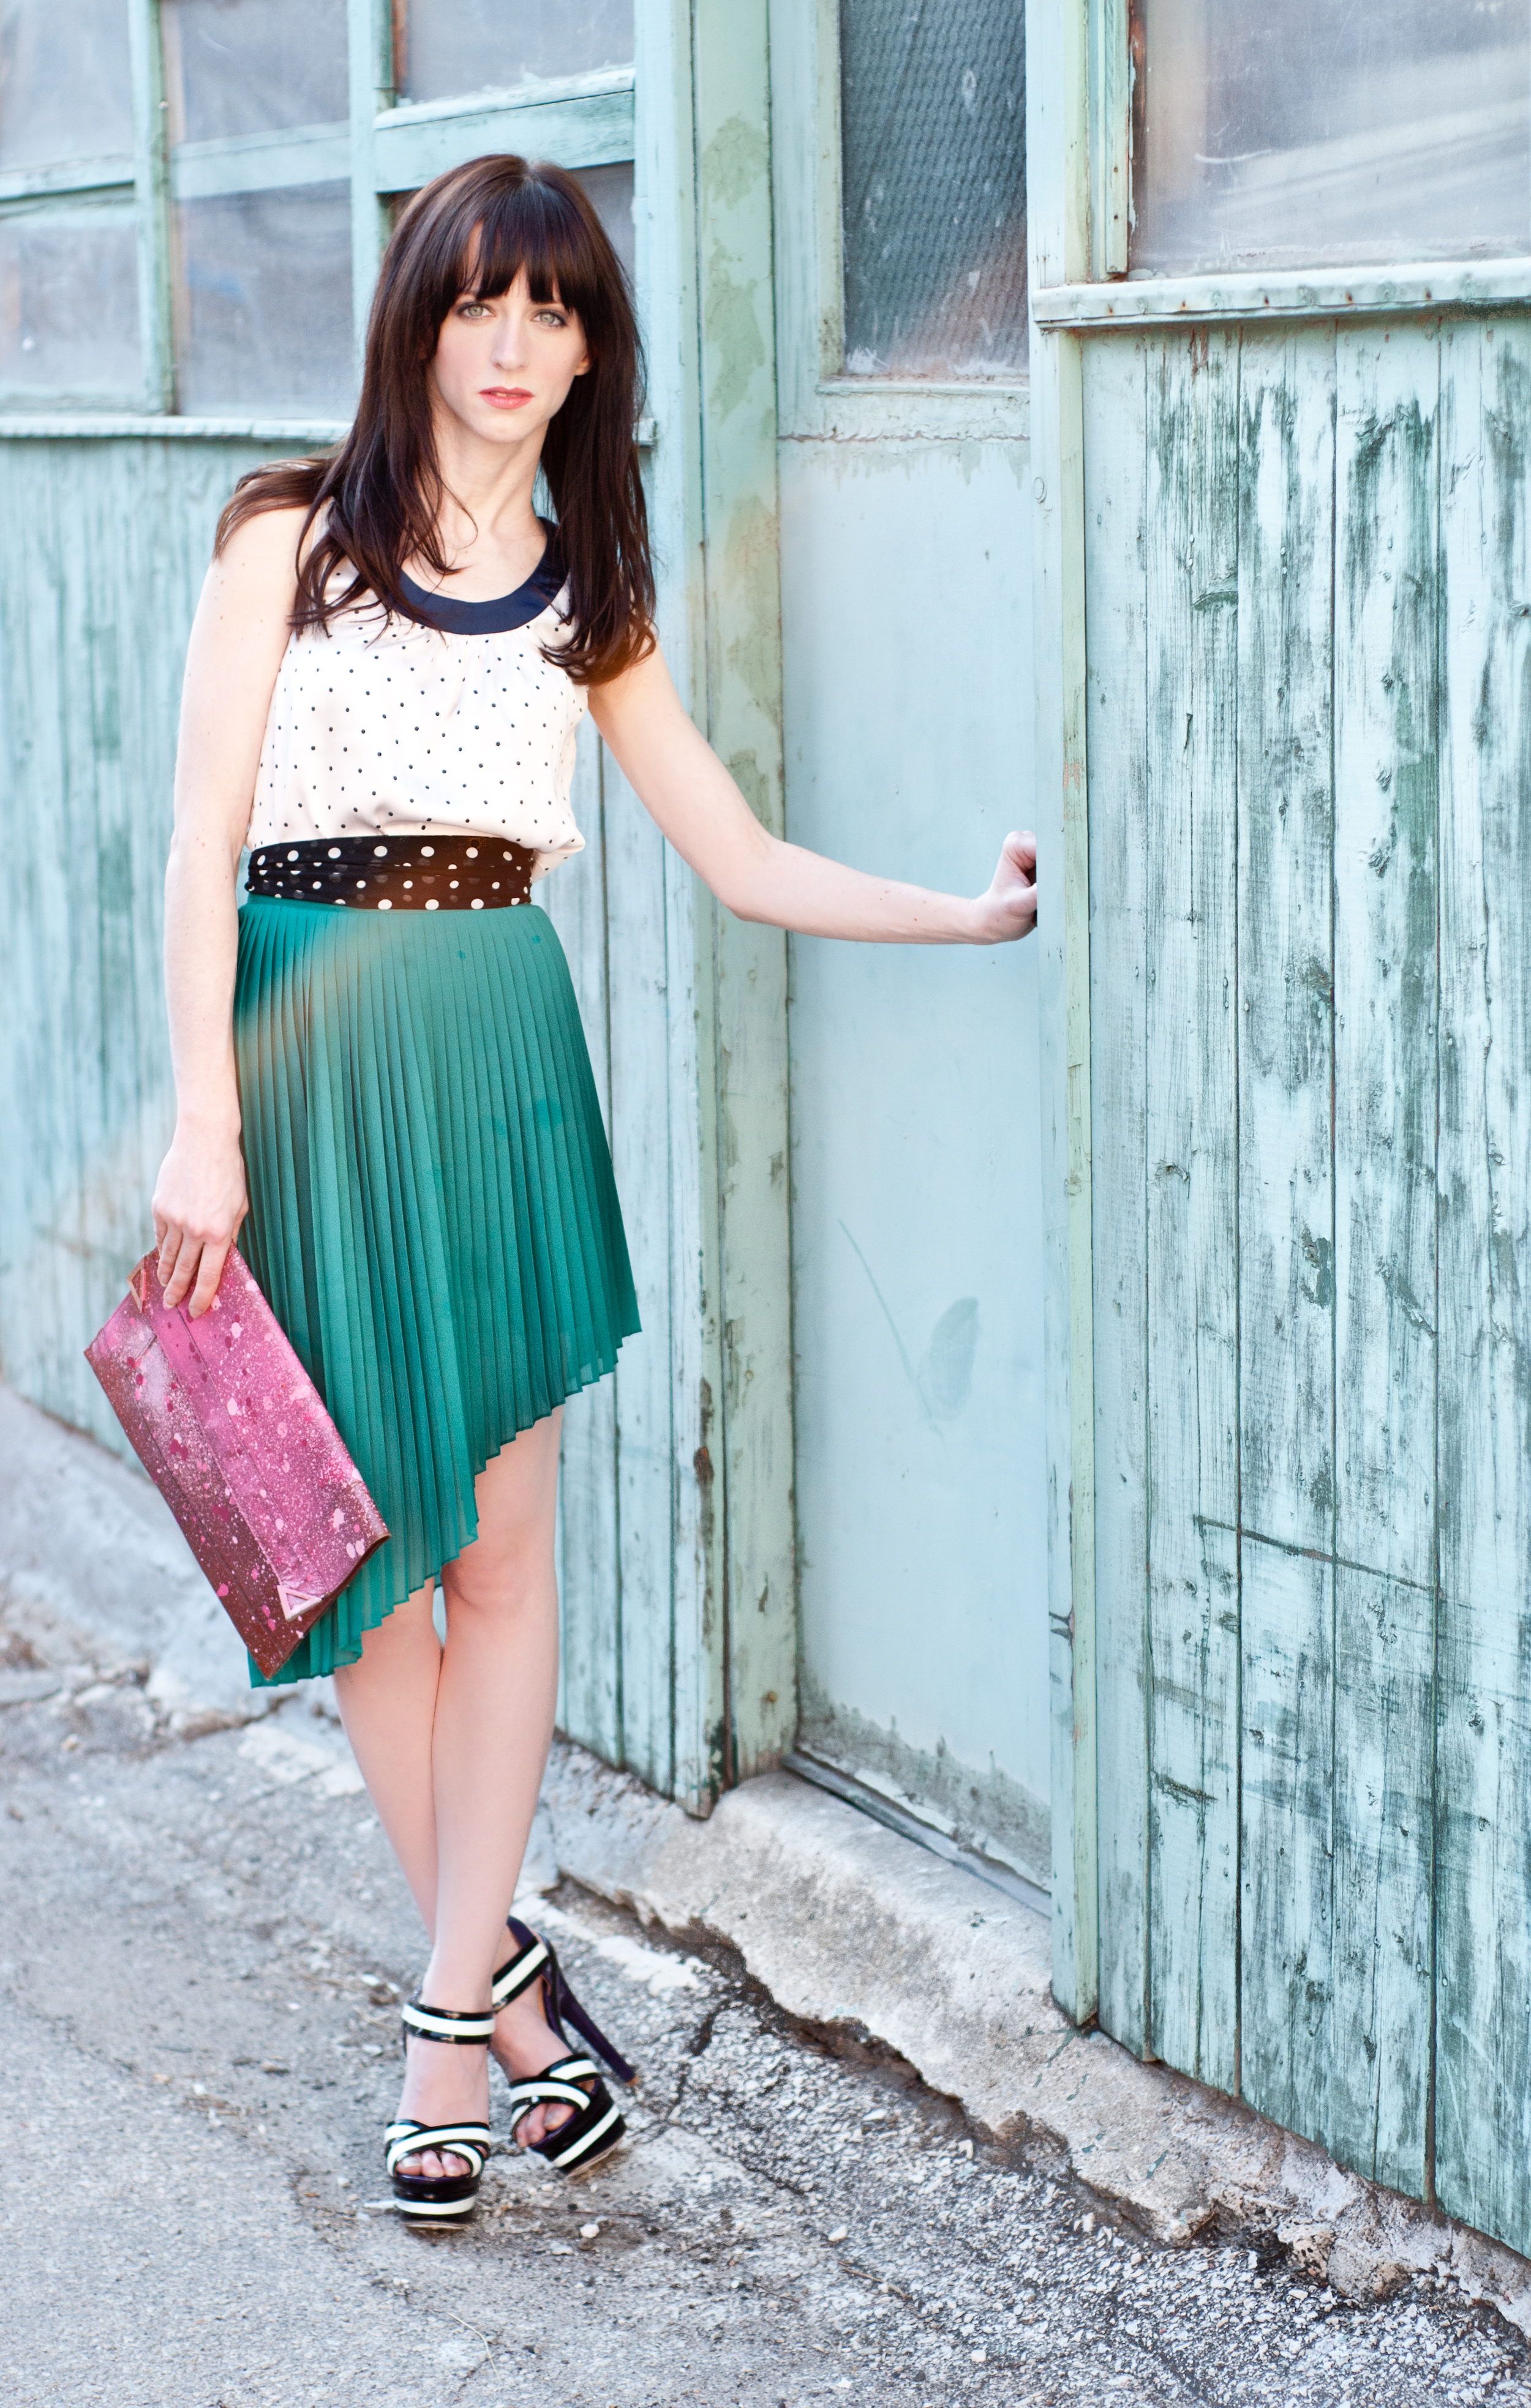 Dyane Campbell - Fashion Shoot 2012- Jessica Olsen-1061.jpg